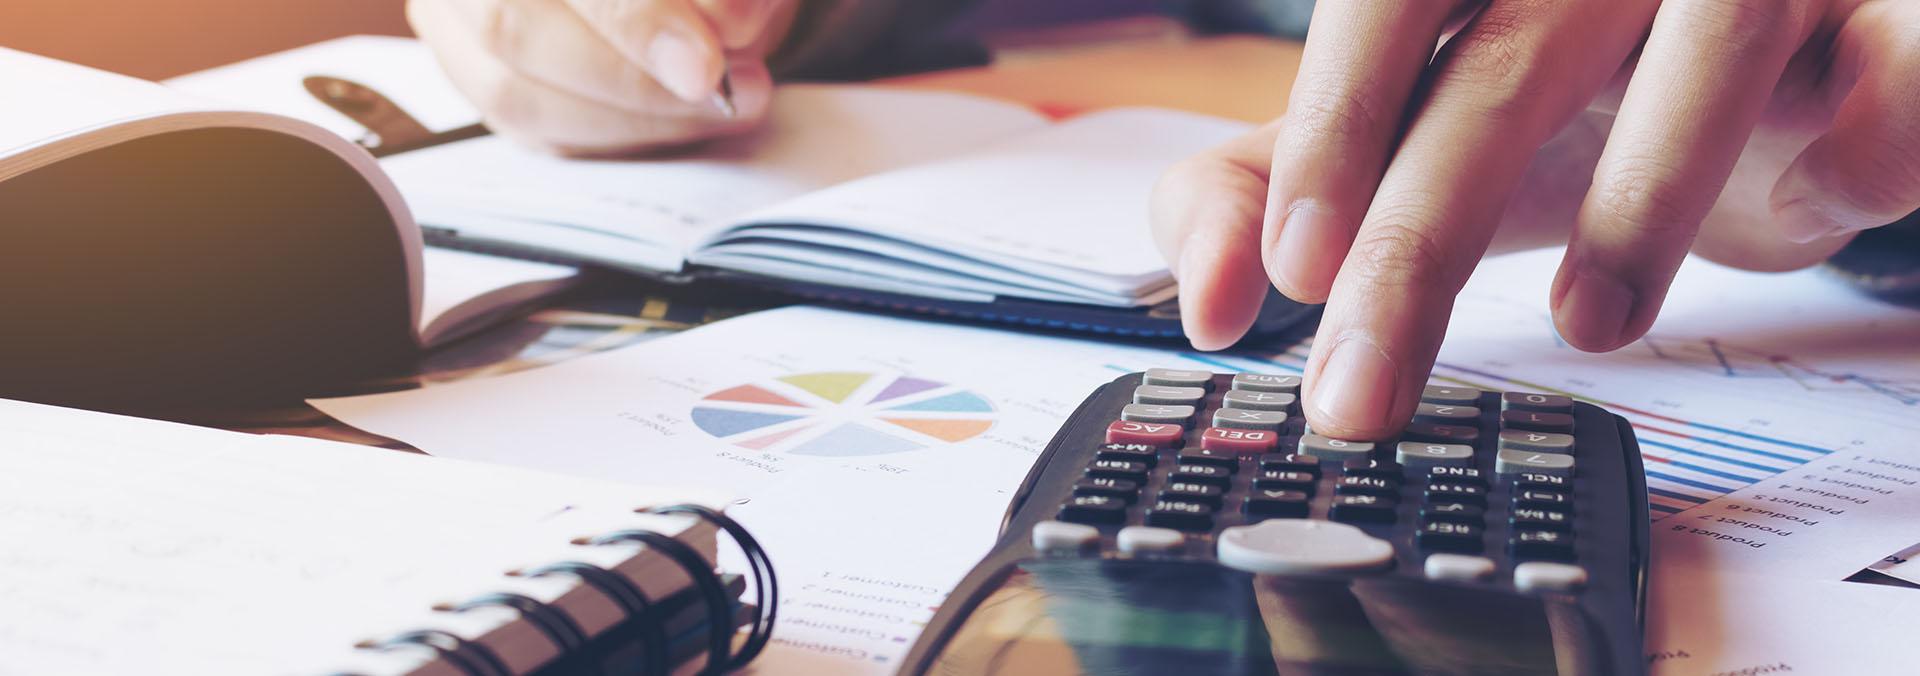 Ekonomi ve Finans (Yükseklisans) (Tezli)